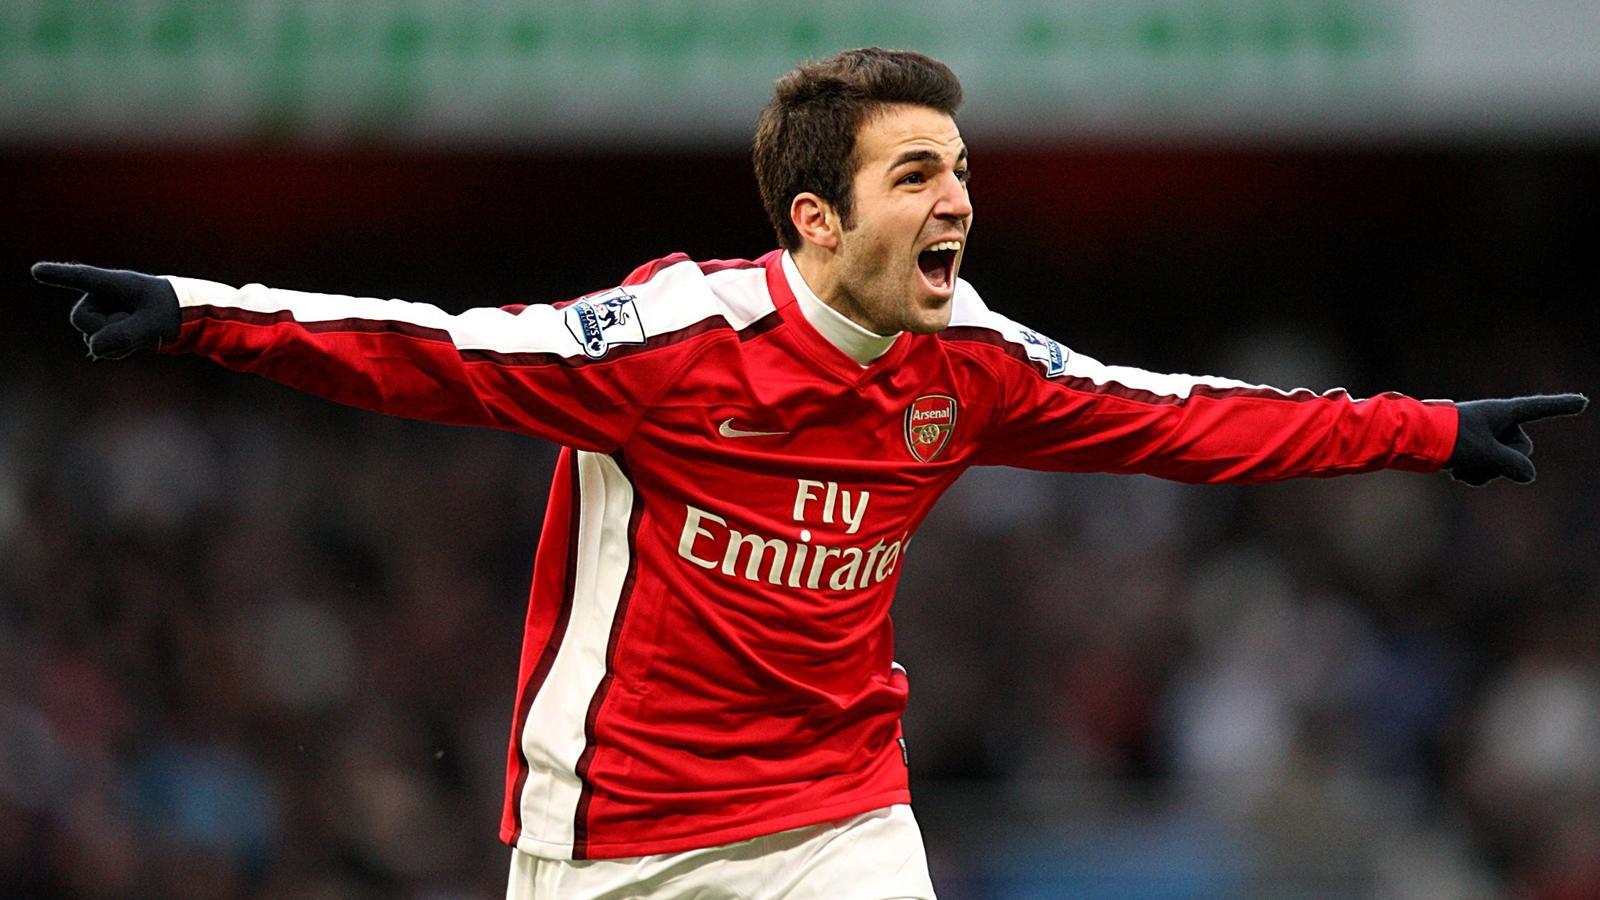 Arsenal Fans Tear Down Cesc Fabregas Banner At Emirates